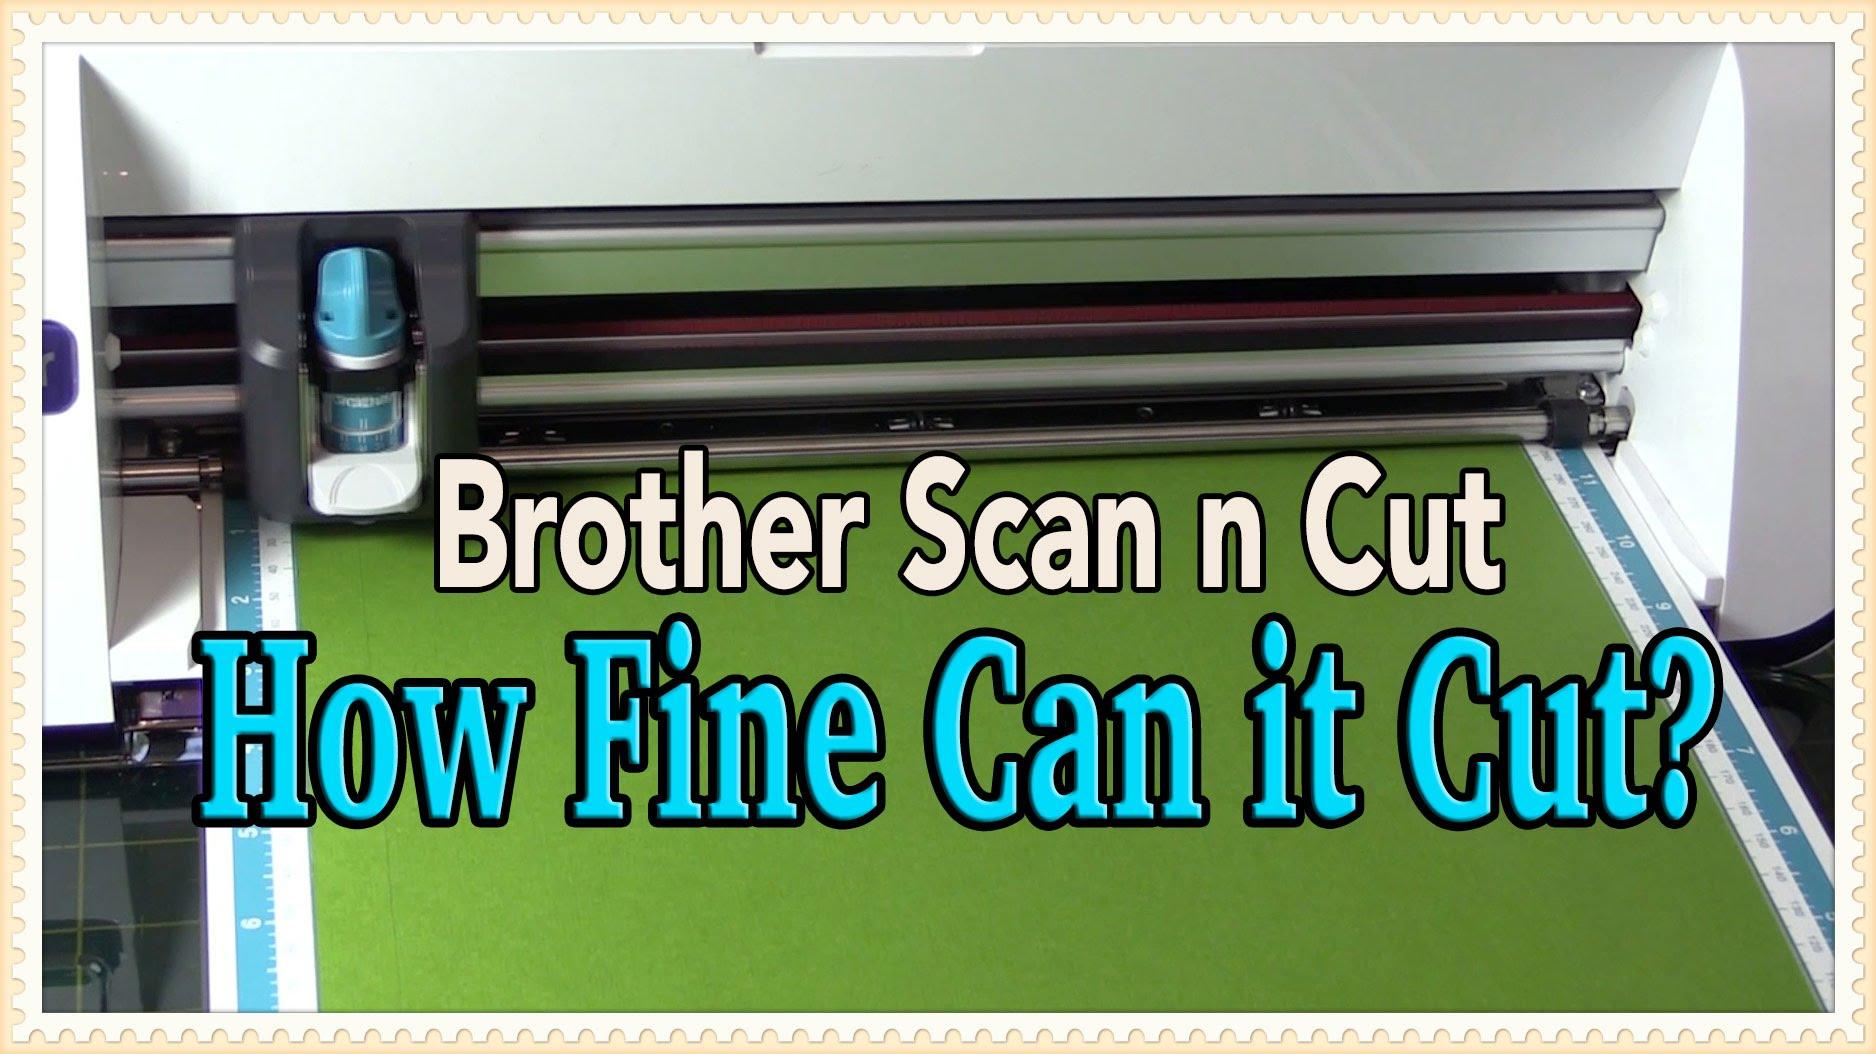 scanncut - how fine can it cut